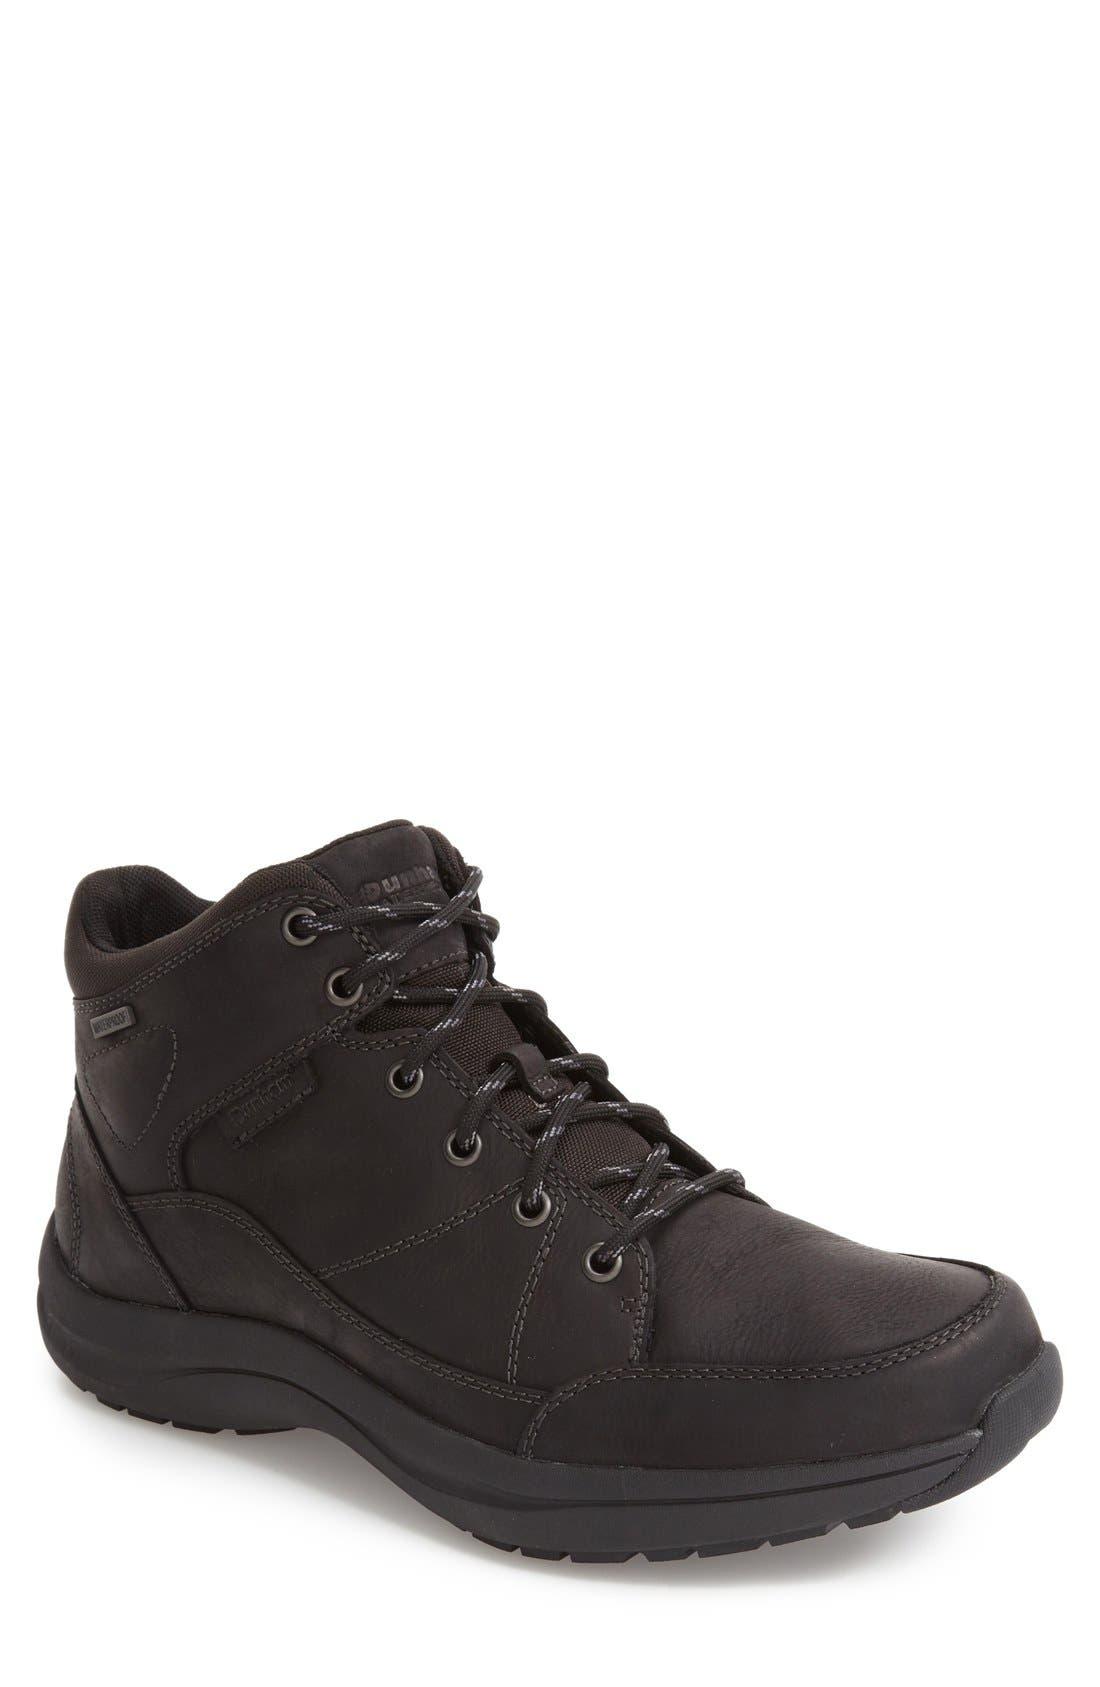 Simon-Dun Waterproof Boot,                         Main,                         color, BLACK LEATHER